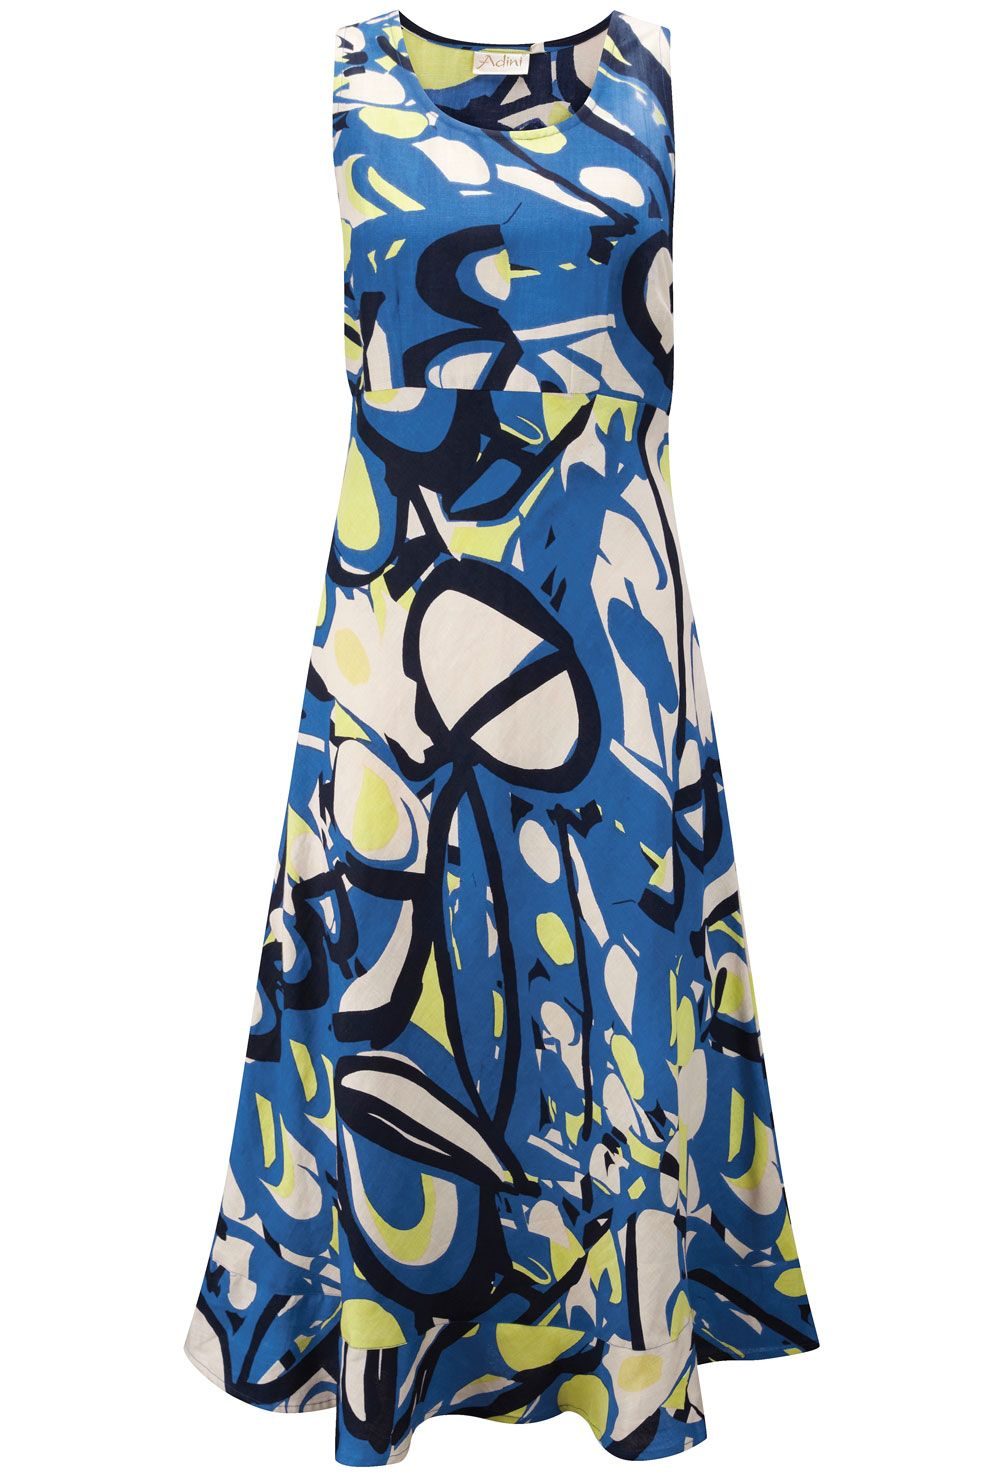 gorgeous pattern & style